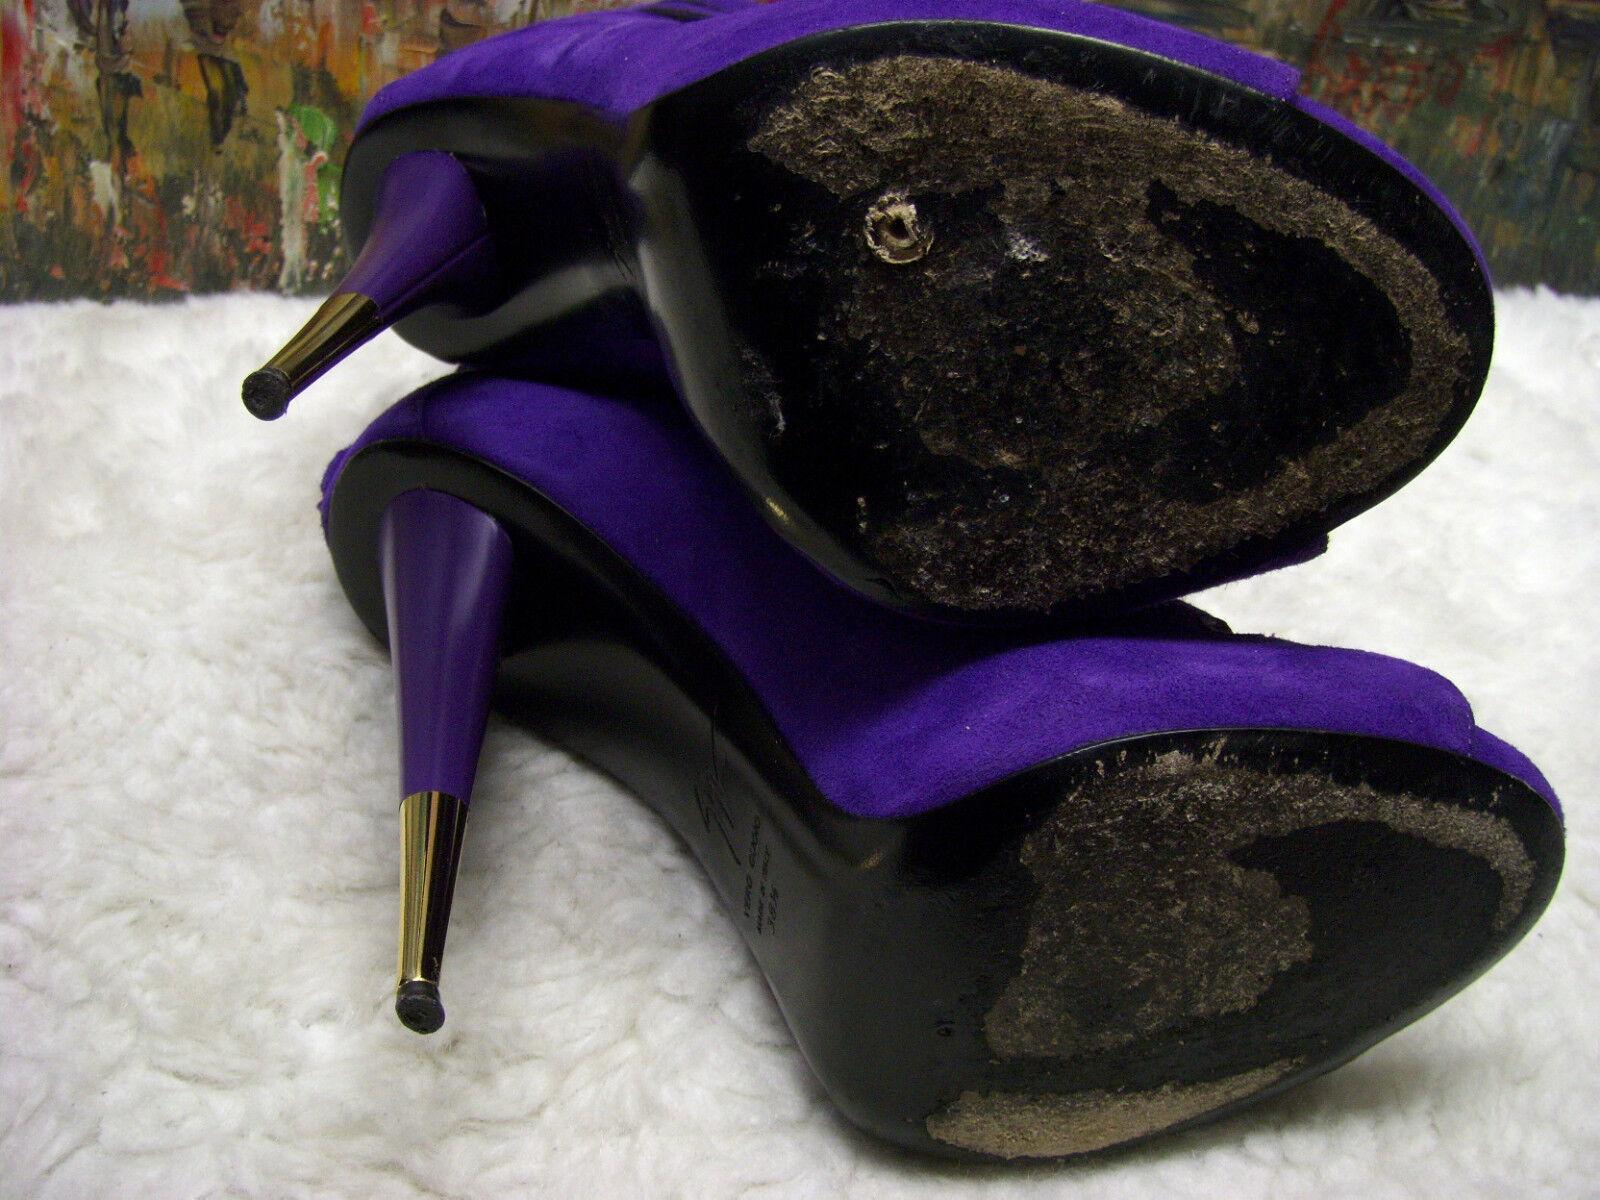 Giuseppe Zanotti Cut Out Sandal Ankle Stiefel Suede Suede Suede Heel - Größe 38.5 -  1095 ac7c5b